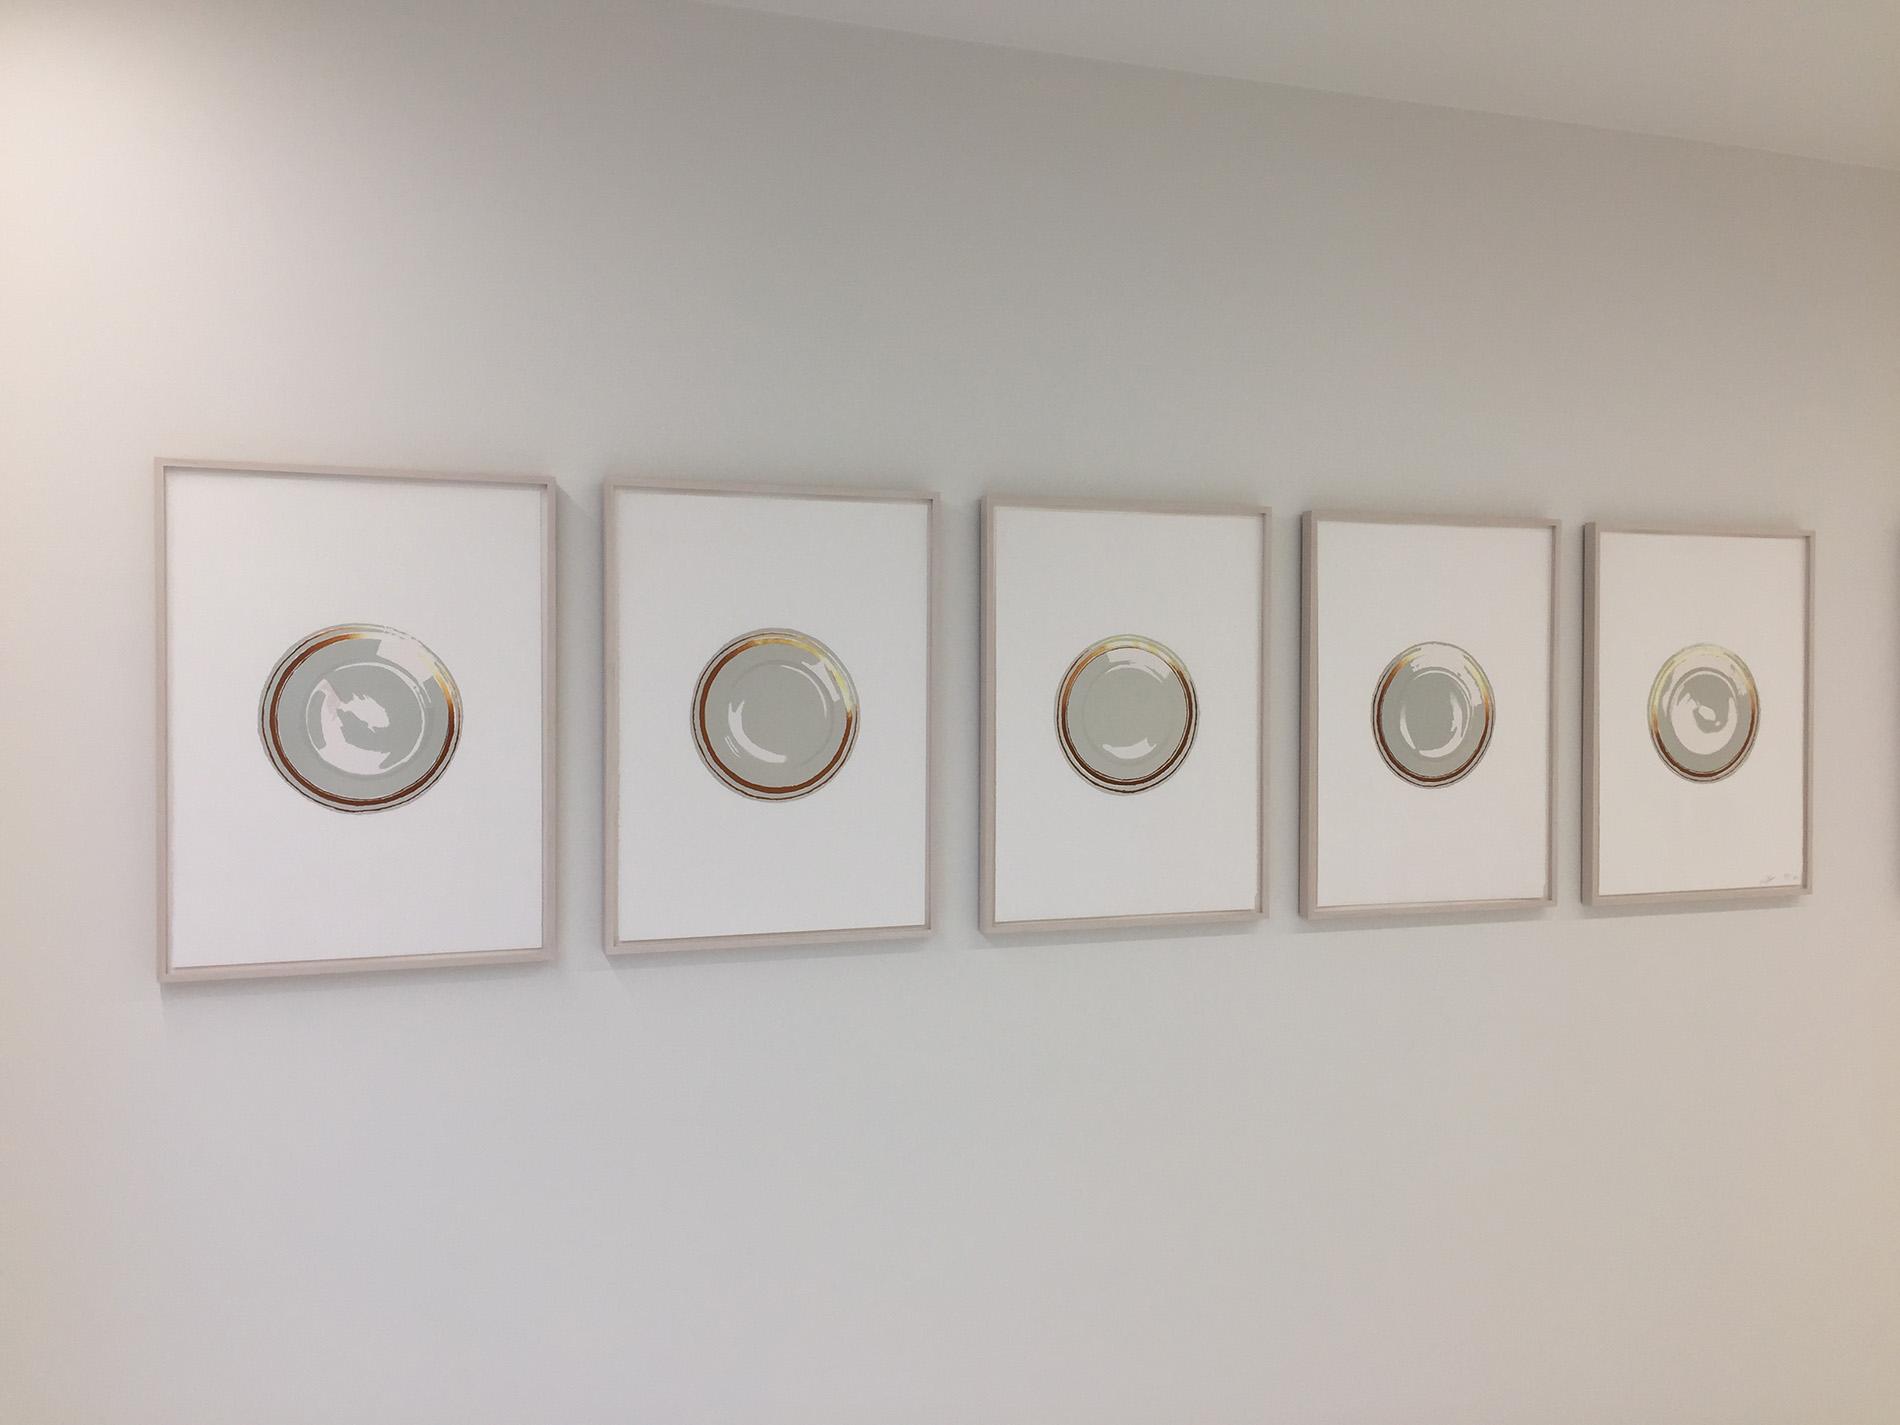 Luc Tuymans | Plates 2012